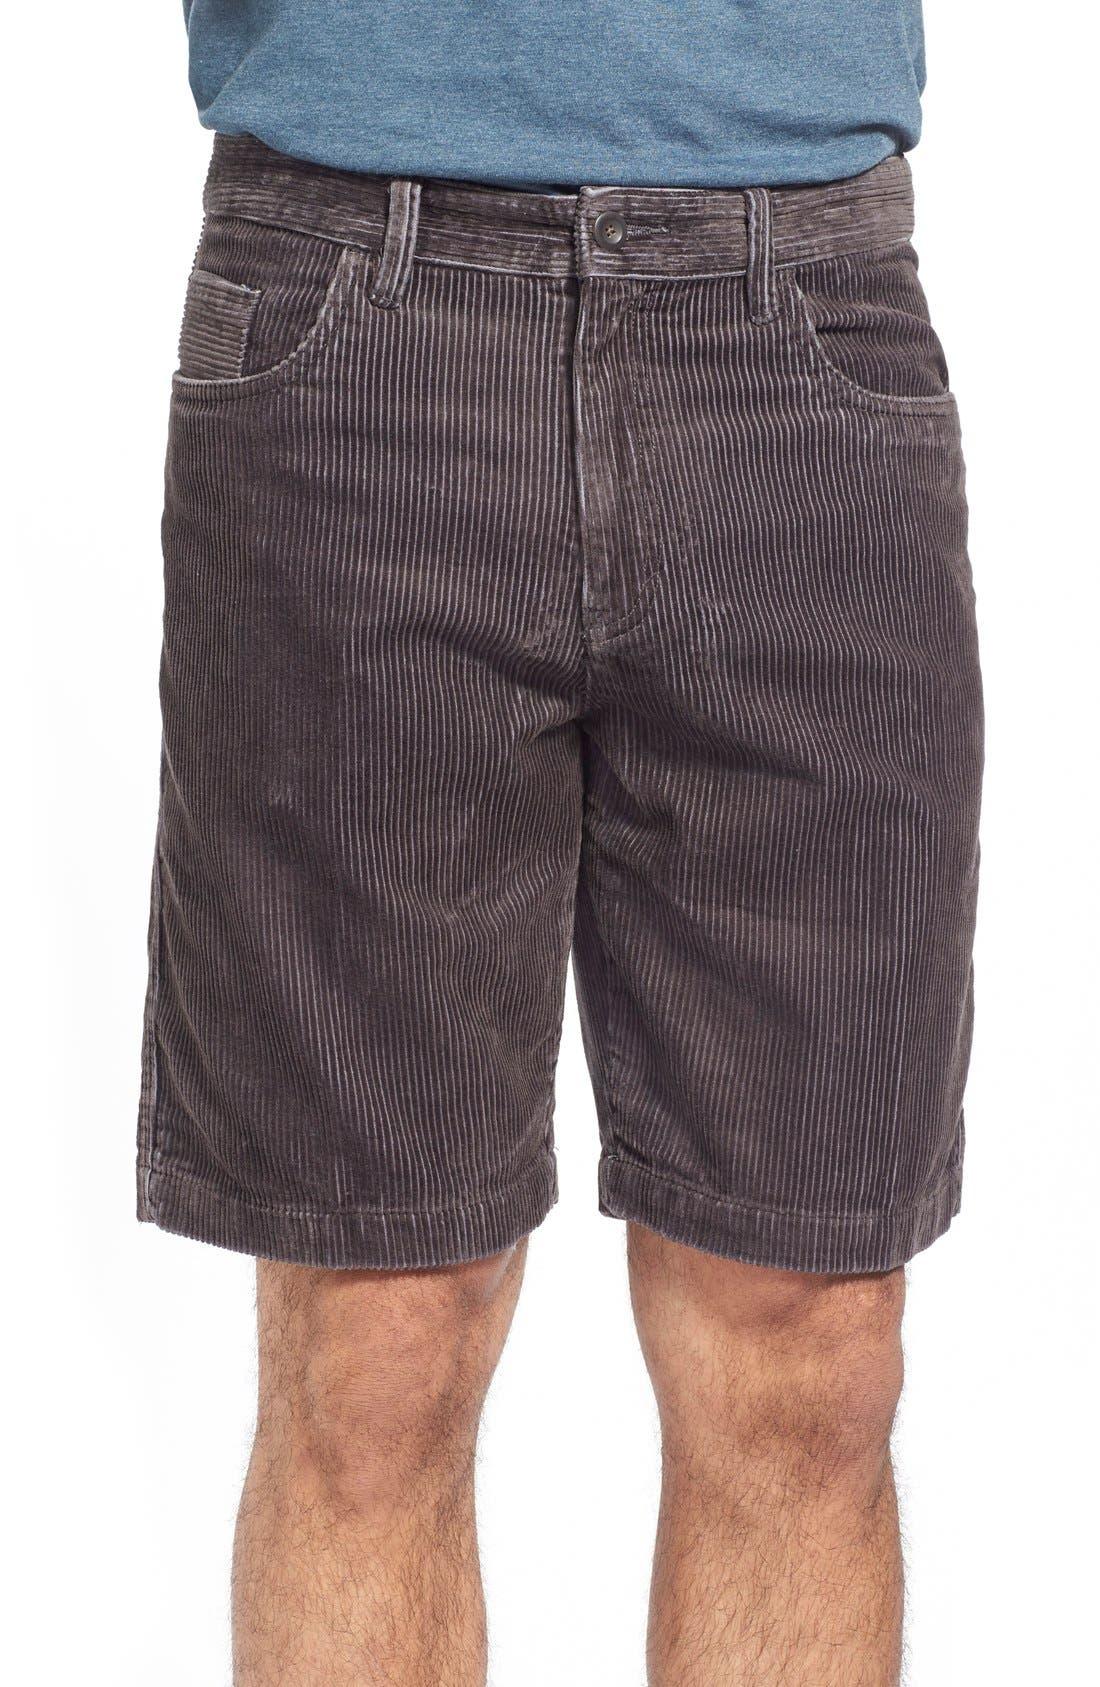 Kordo Corduroy Walking Shorts,                             Main thumbnail 2, color,